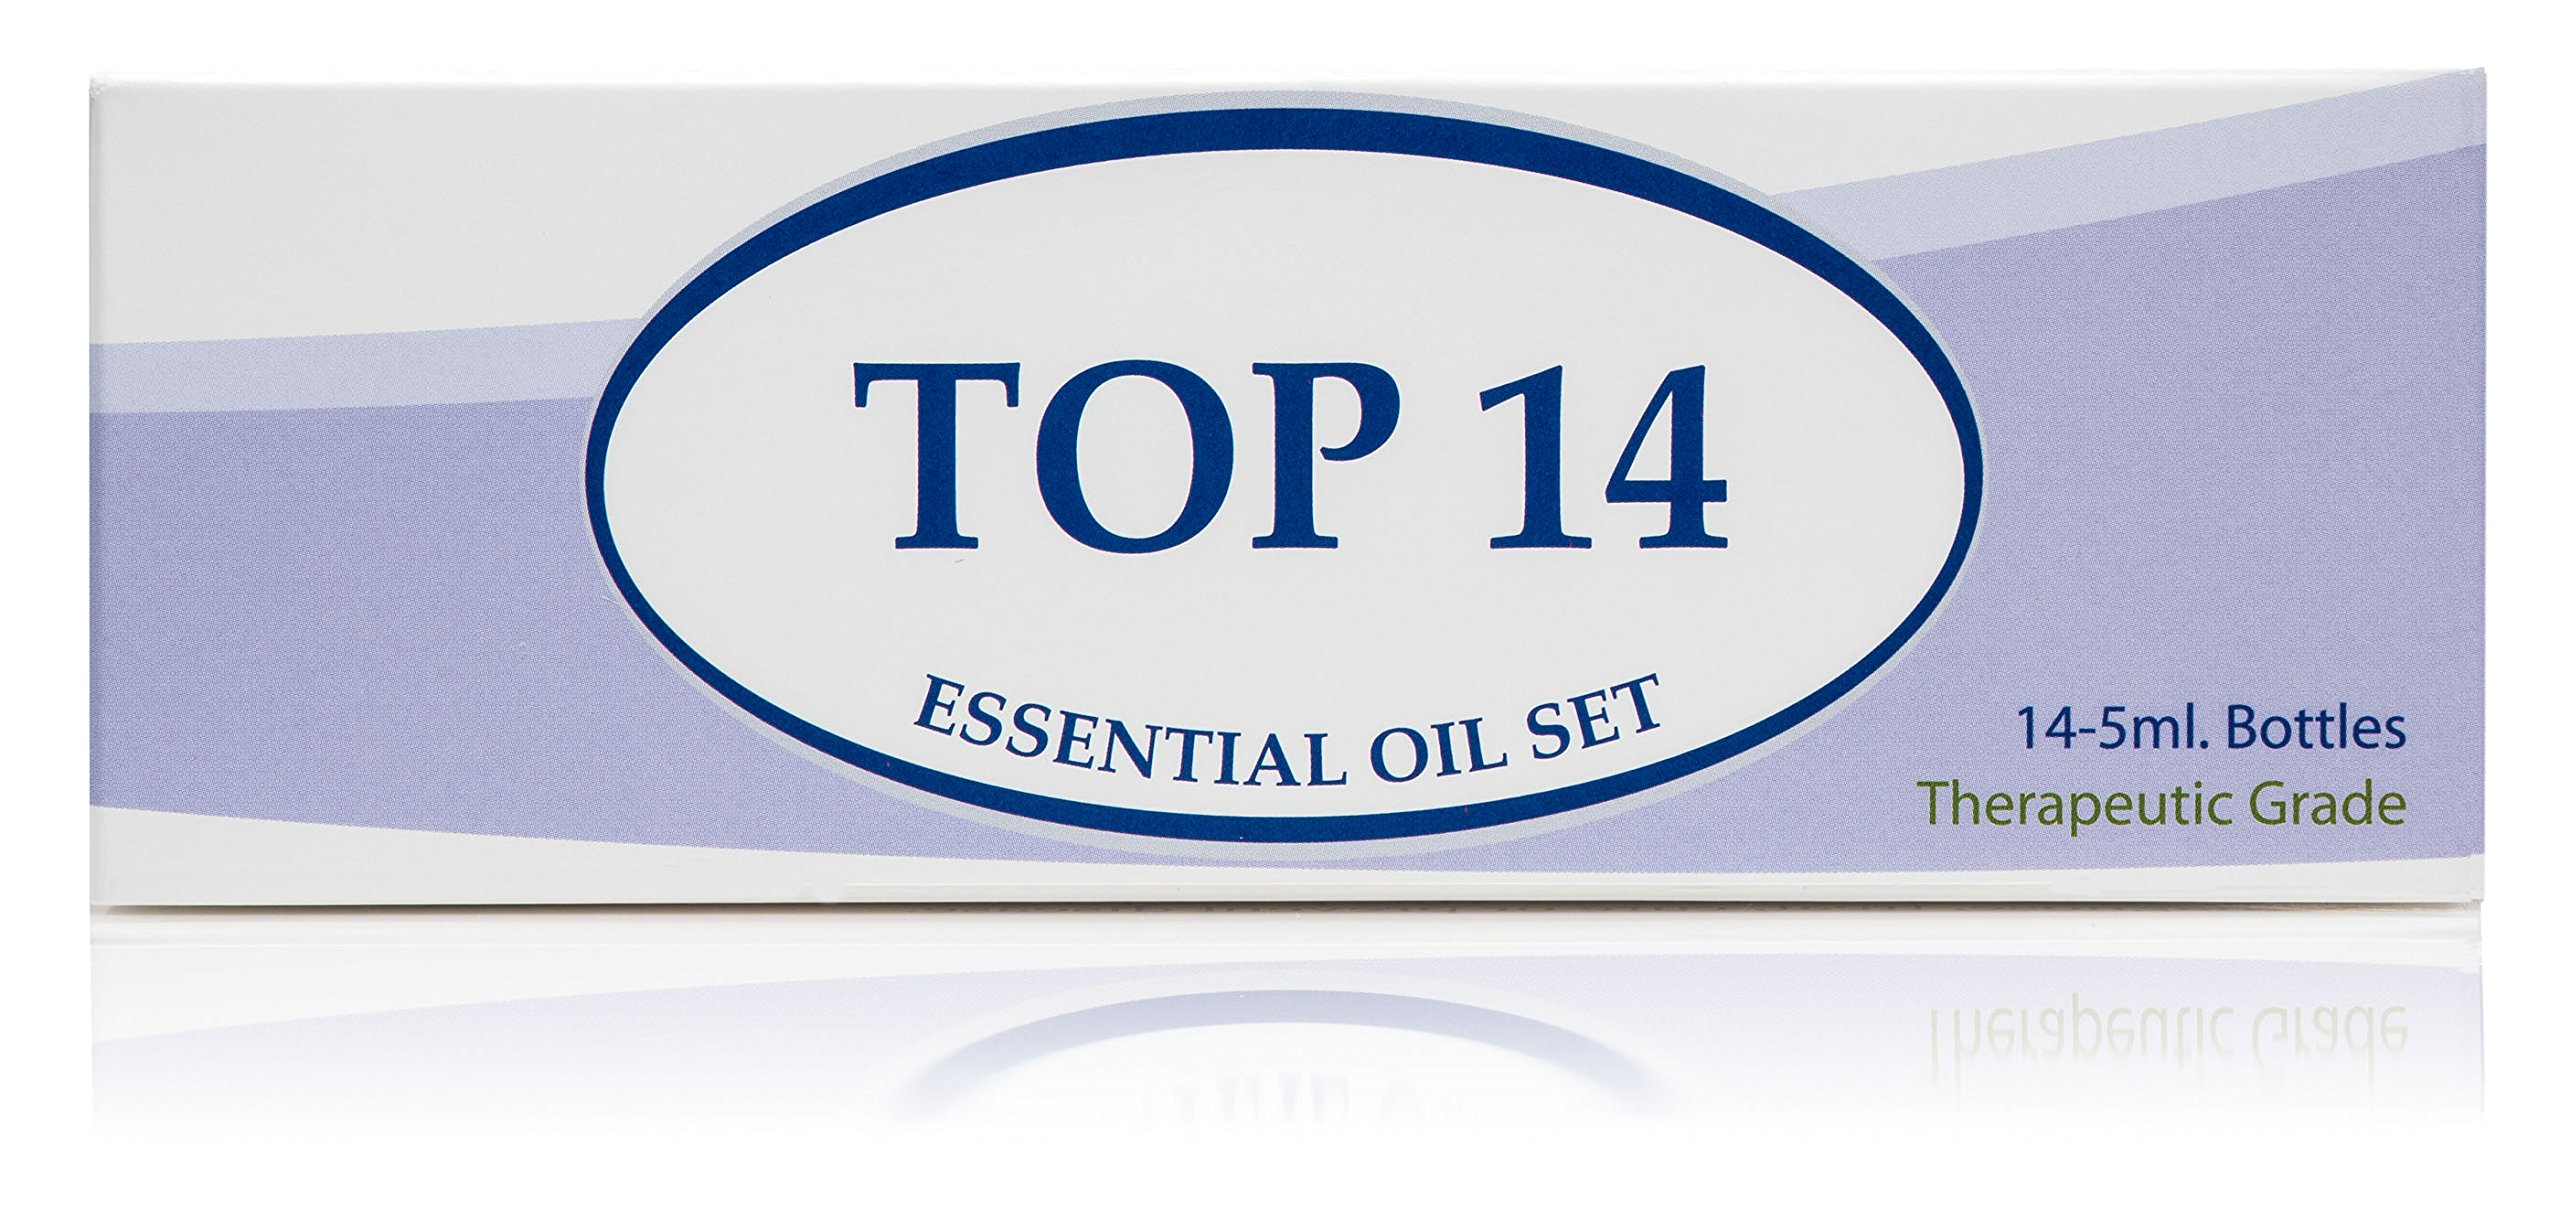 Essential Oil Set 14-5 ml Therapeutic Grade 100% Pure Frankincense, Lavender, Peppermint, Rosemary, Orange, Tea Tree, Eucalyptus, Grapefruit, Lemon, Lime, Clove, Spearmint, Lemongrass, Cinnamon by Plant Guru (Image #5)